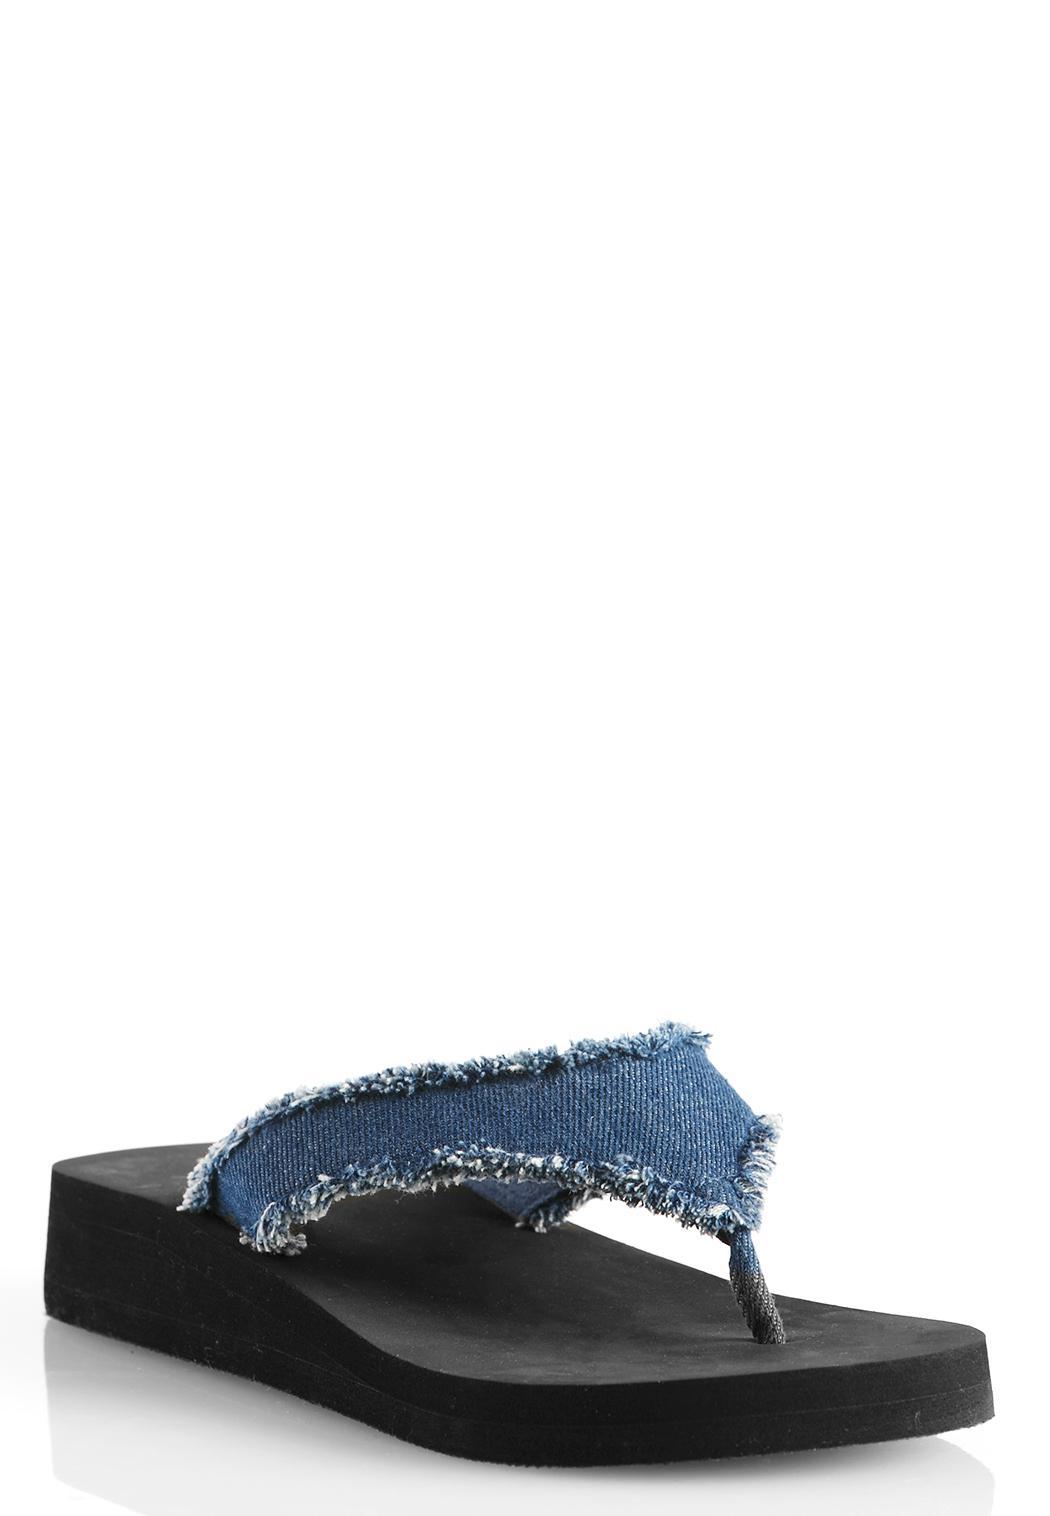 8fbc8705e154 Frayed Denim Platform Flip Flops Flip Flops Cato Fashions